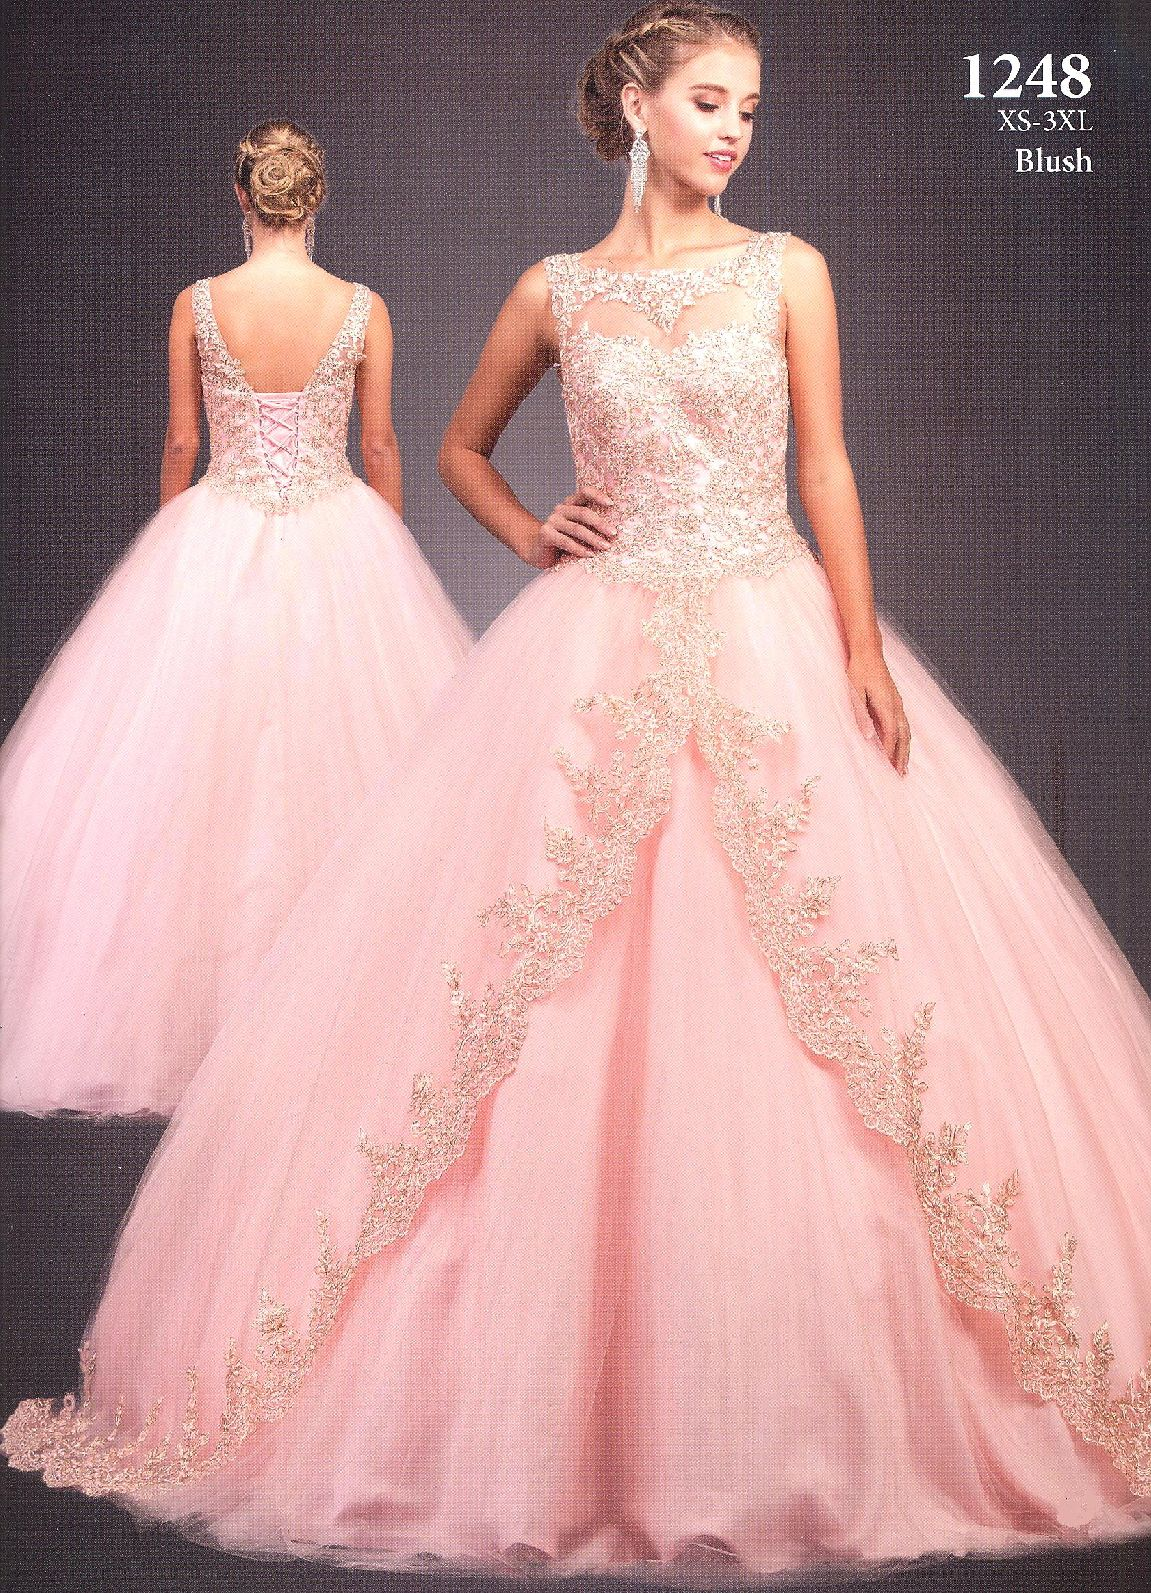 Hermosa Boda Cardiff Alquiler Traje Modelo - Colección de Vestidos ...